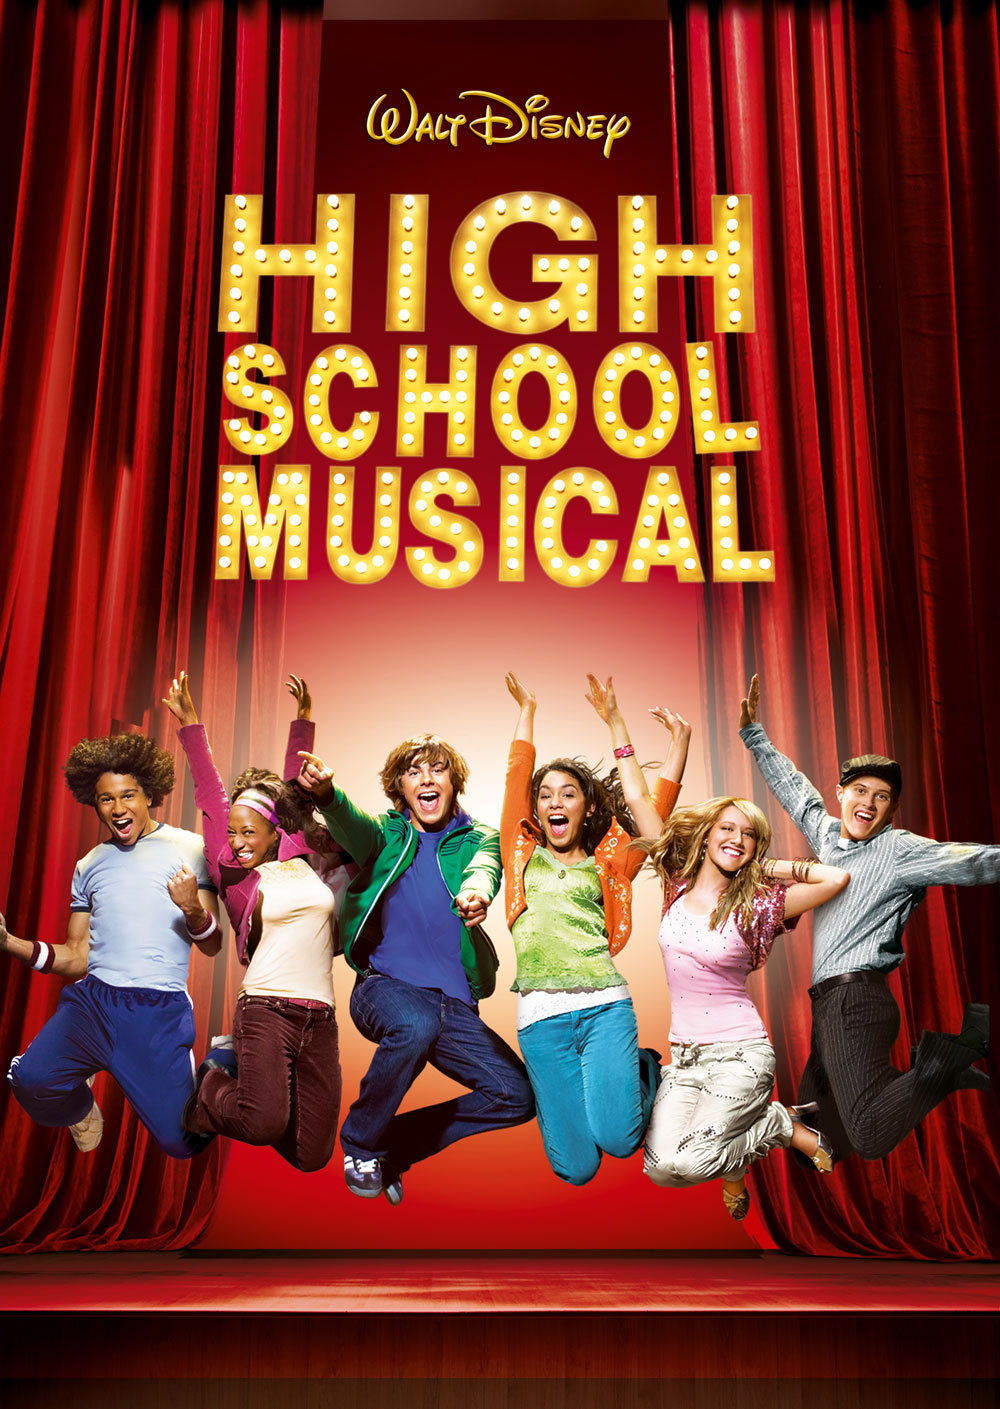 1000x1409 > High School Musical Wallpapers